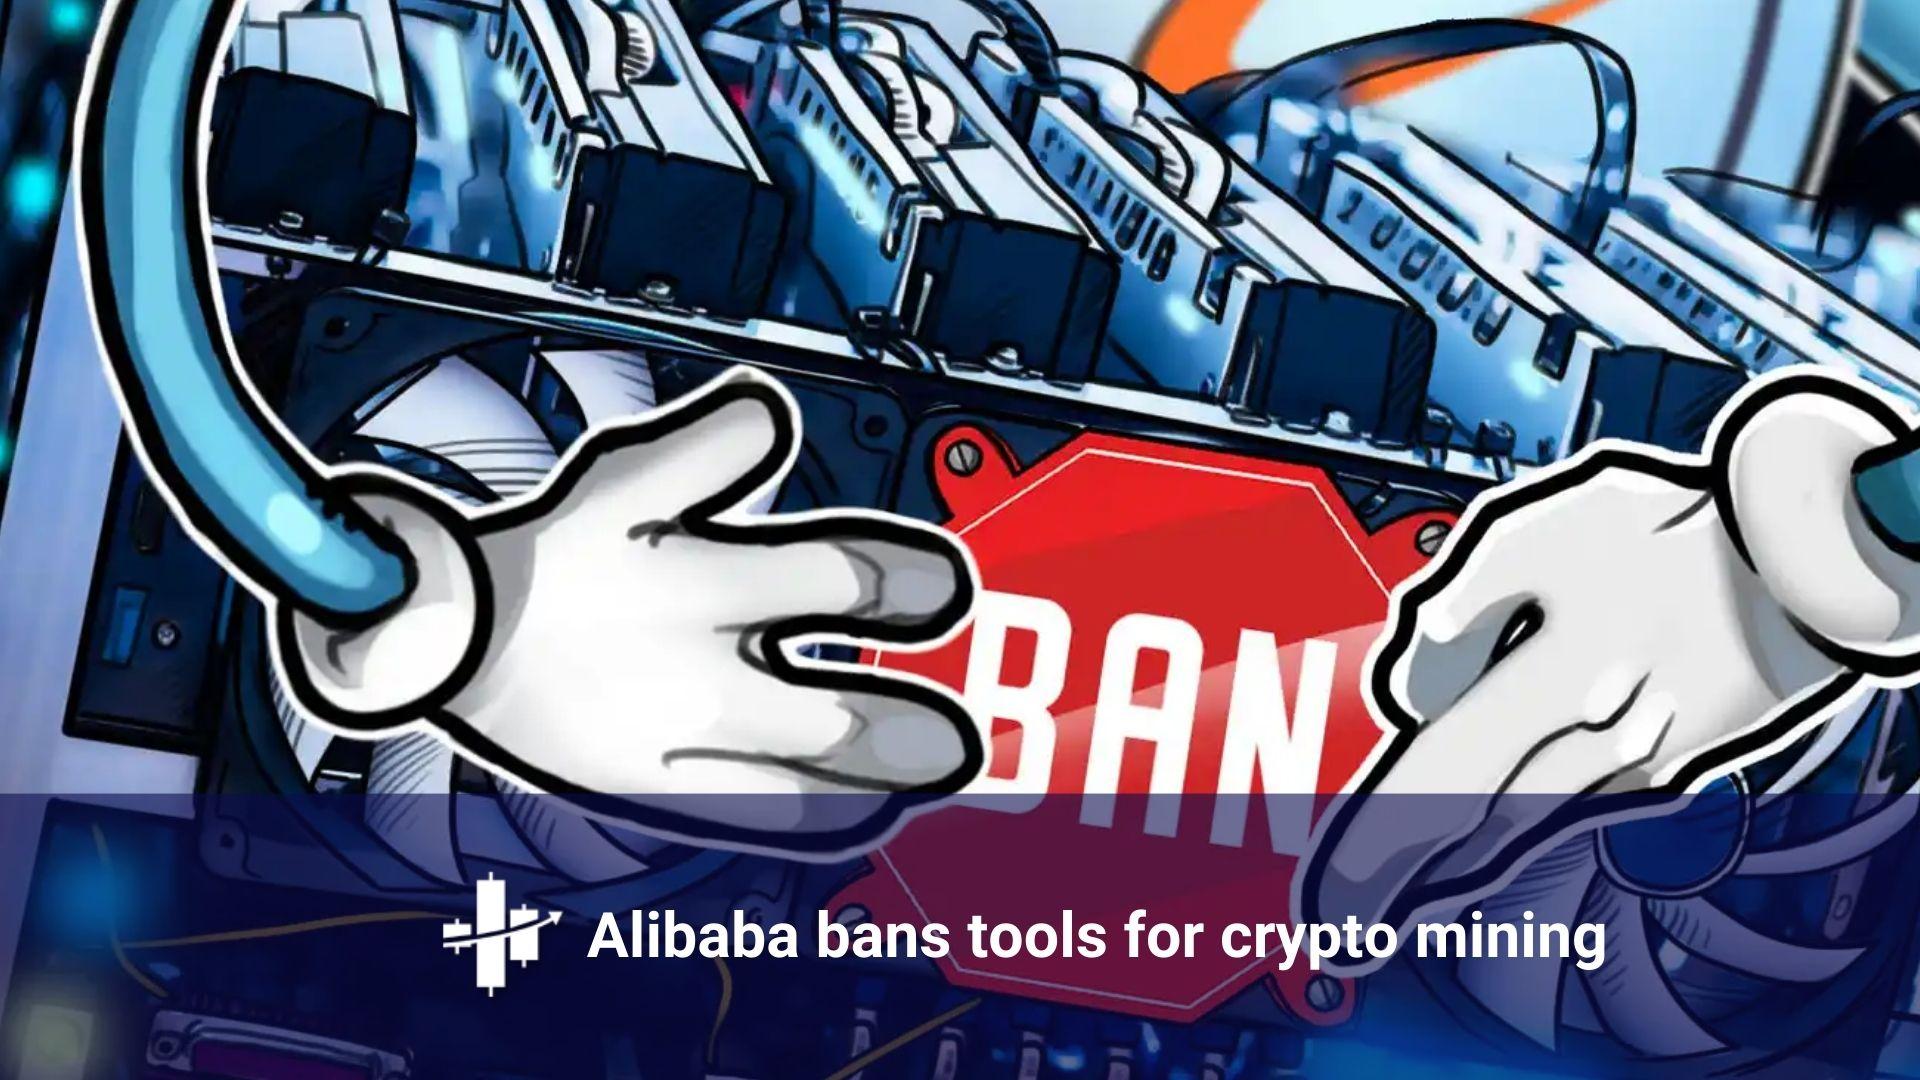 Alibaba Bans Sales of Crypto Mining Equipment